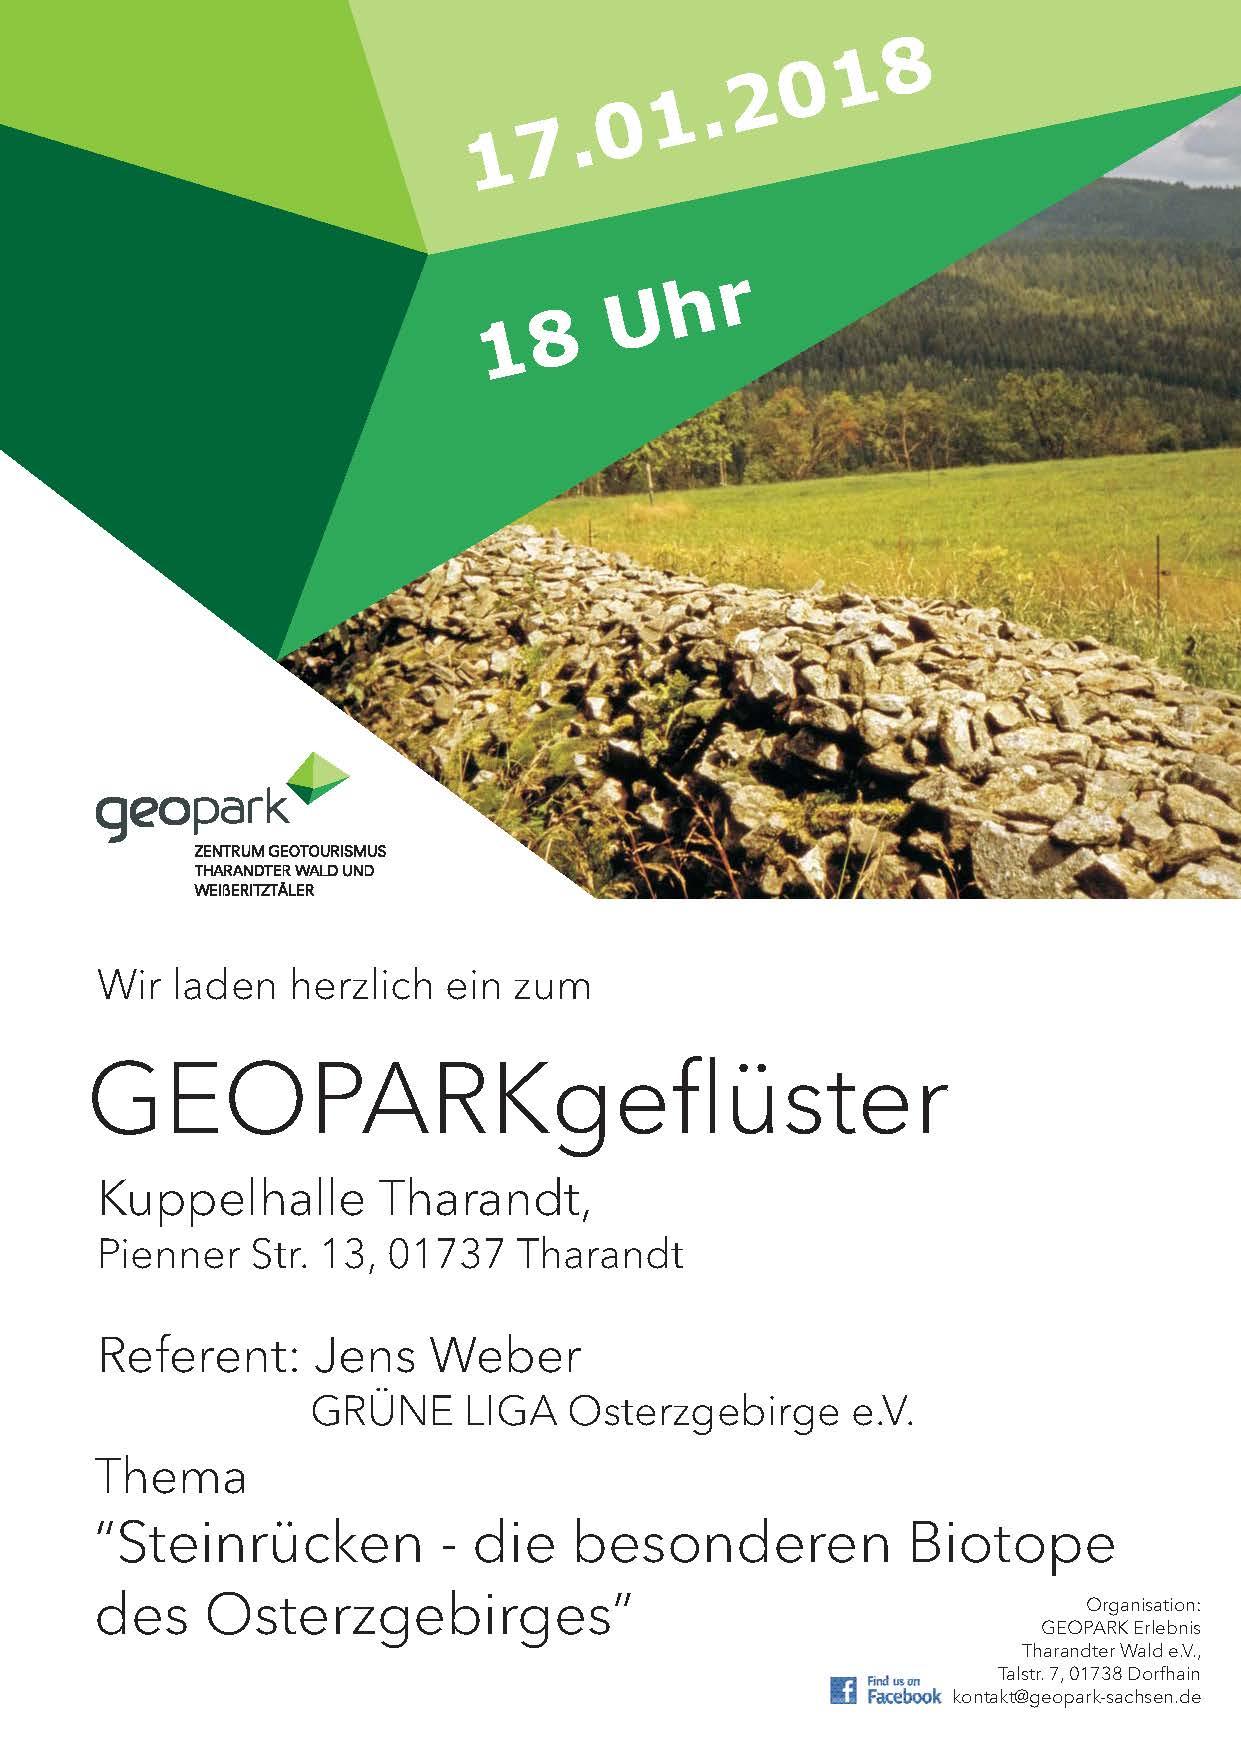 2018-01-17_Geopark_S.1.jpg